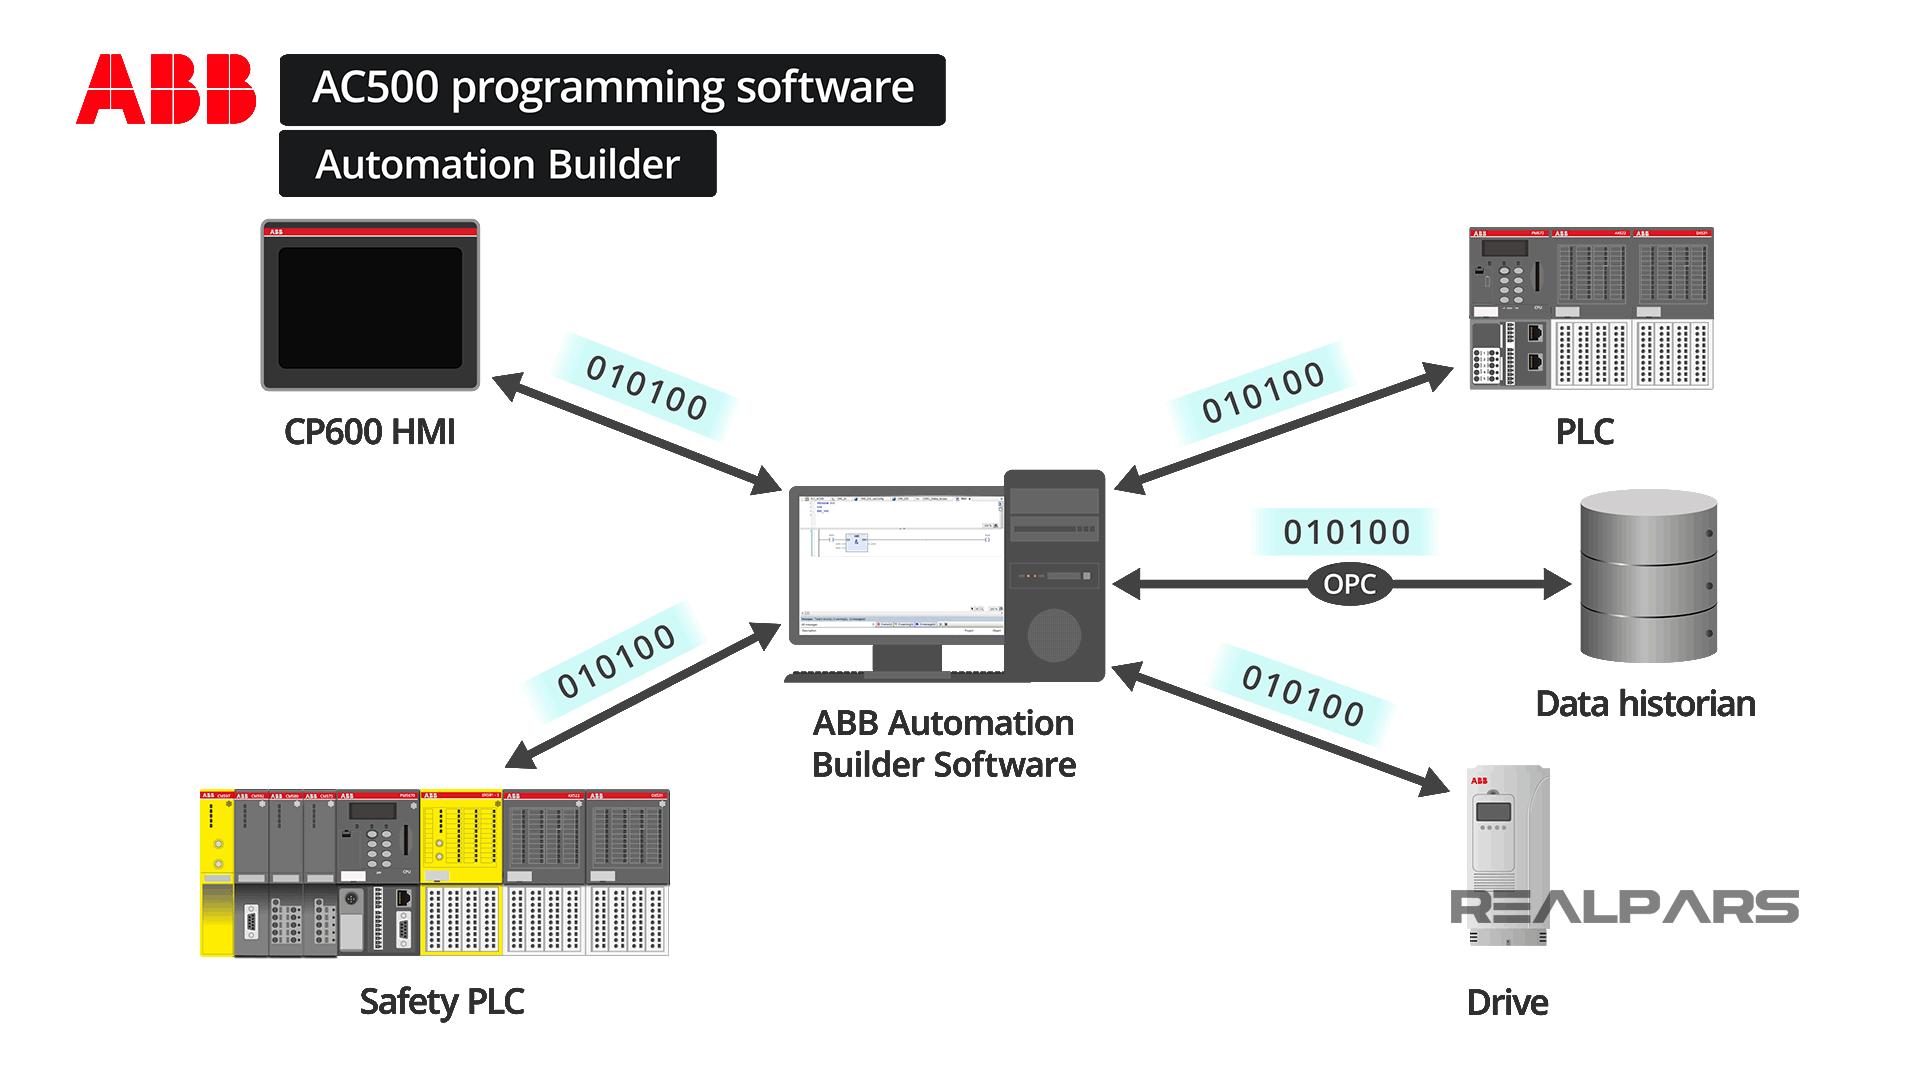 ABB Automation Builder Software Configuration